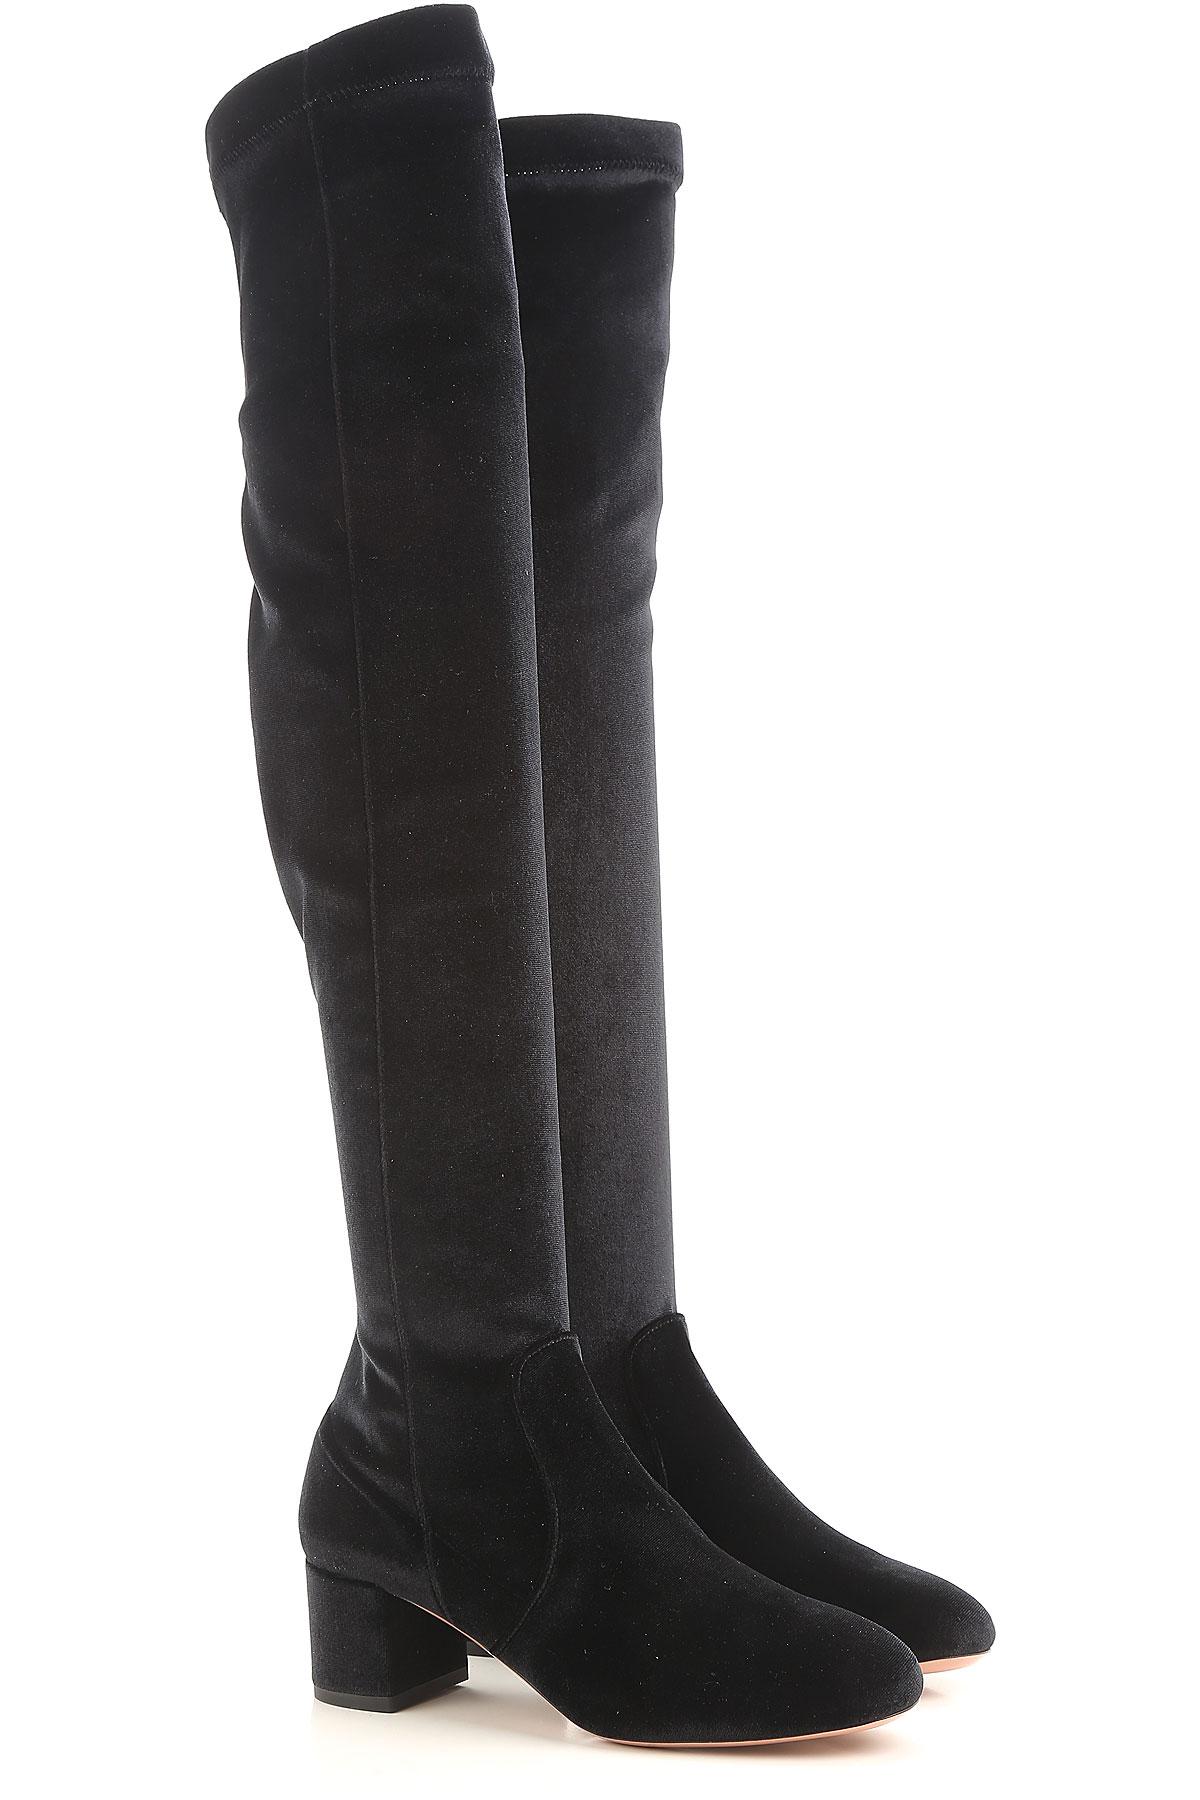 Aquazzura Boots For Women, Booties On Sale In Outlet, Black, Velvet, 2019, 2.5